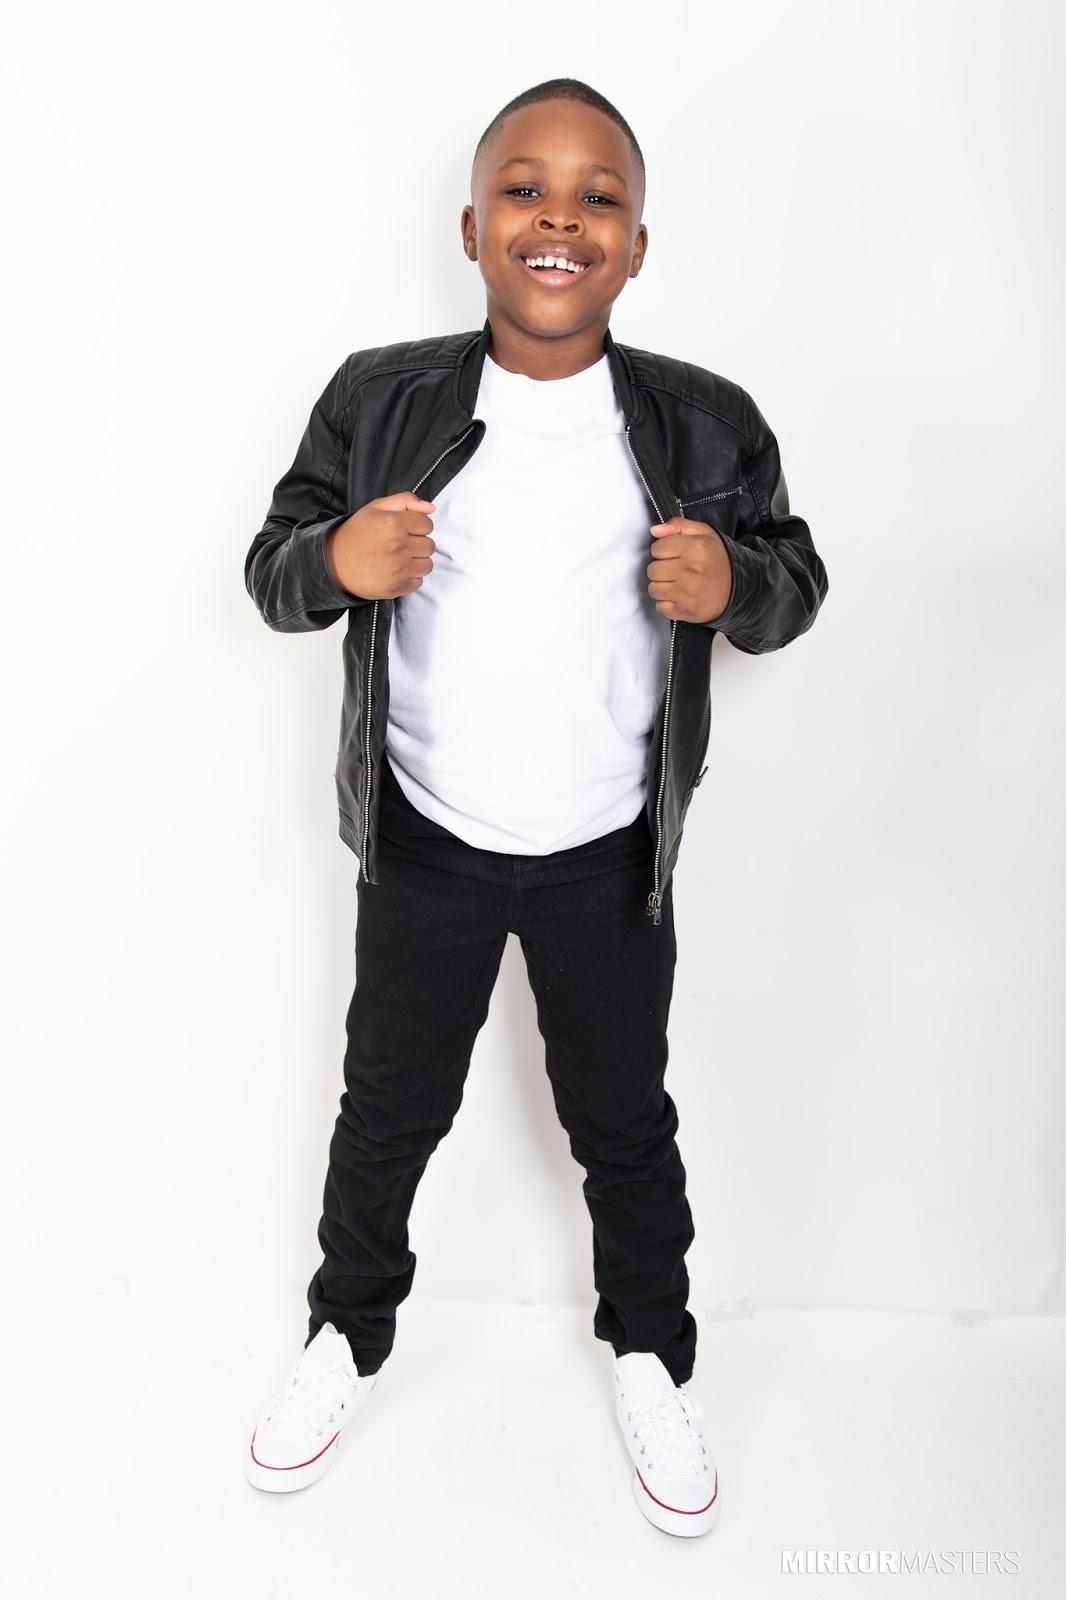 Introducing: Young Actor Daniel Bintsanya